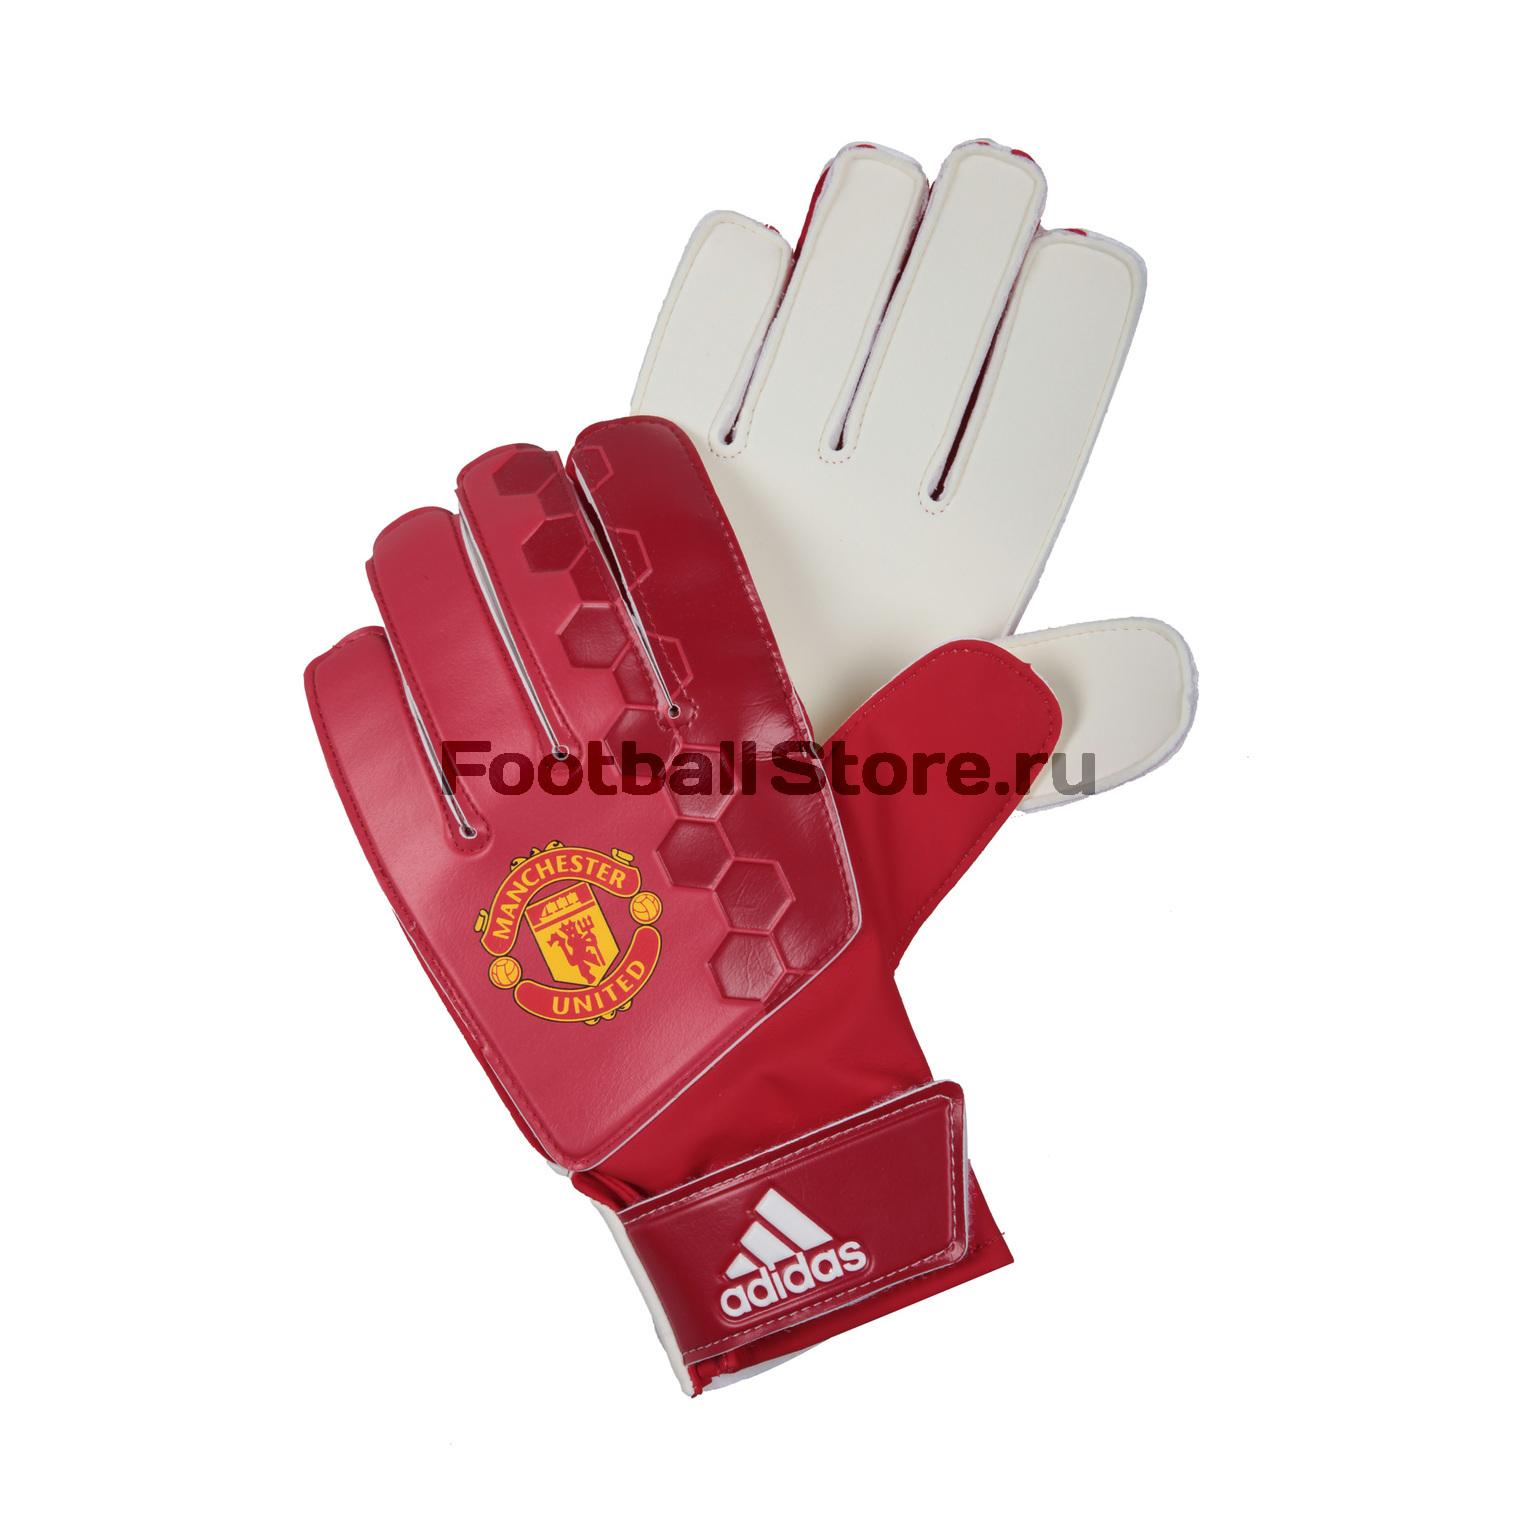 Перчатки вратарские Adidas Manchester United AP7019 цена